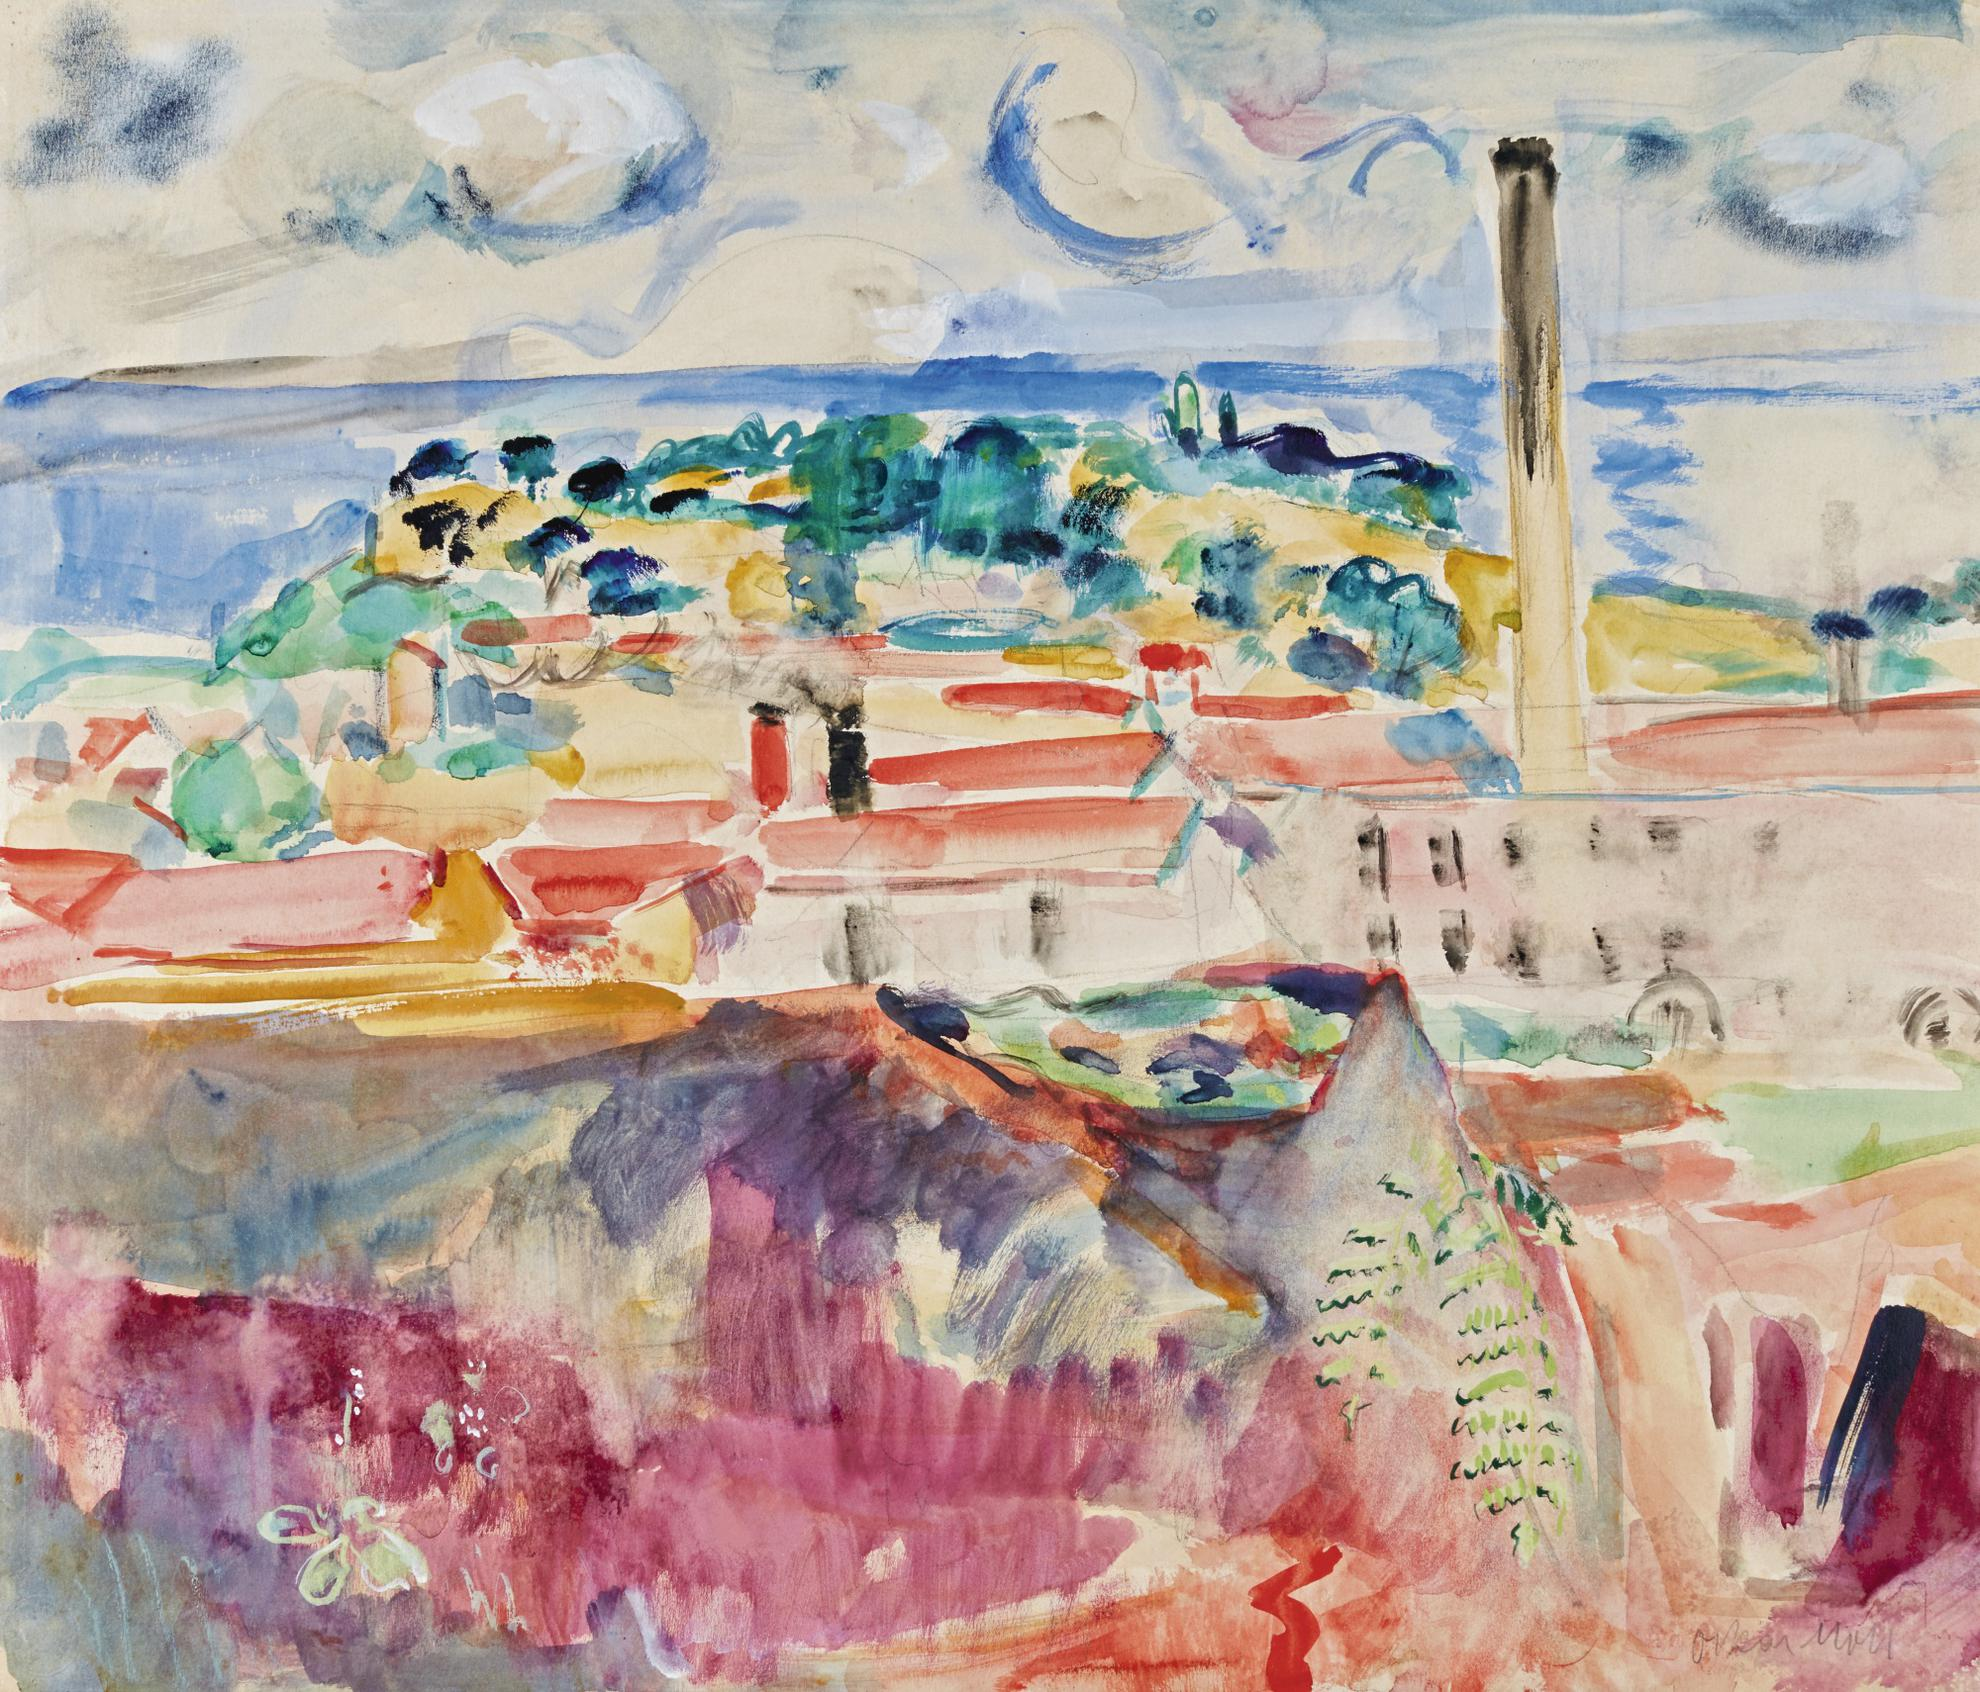 Oskar Moll - Sudliche Landschaft Mit Industrie (Southern Landscape With Factory Building)-1922